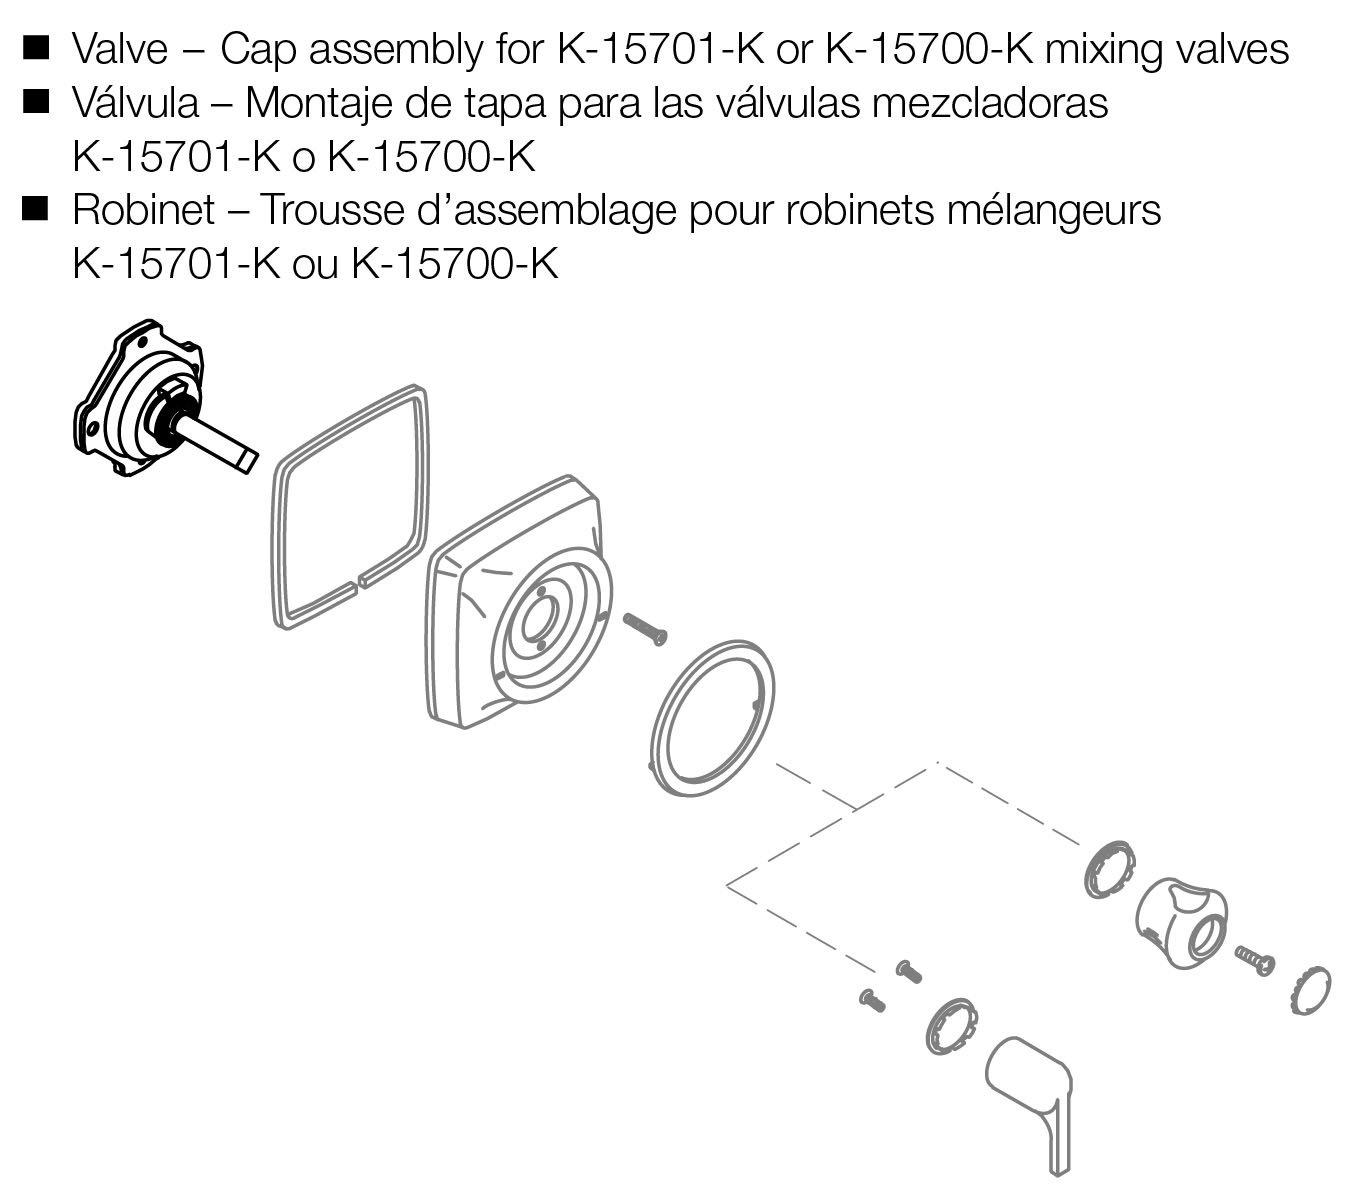 Kohler Genuine Part Gp77886 Mixer Cap For Older Style Coralais Diagram Old Shower Valve Stems Pressure Balance Brass Stem